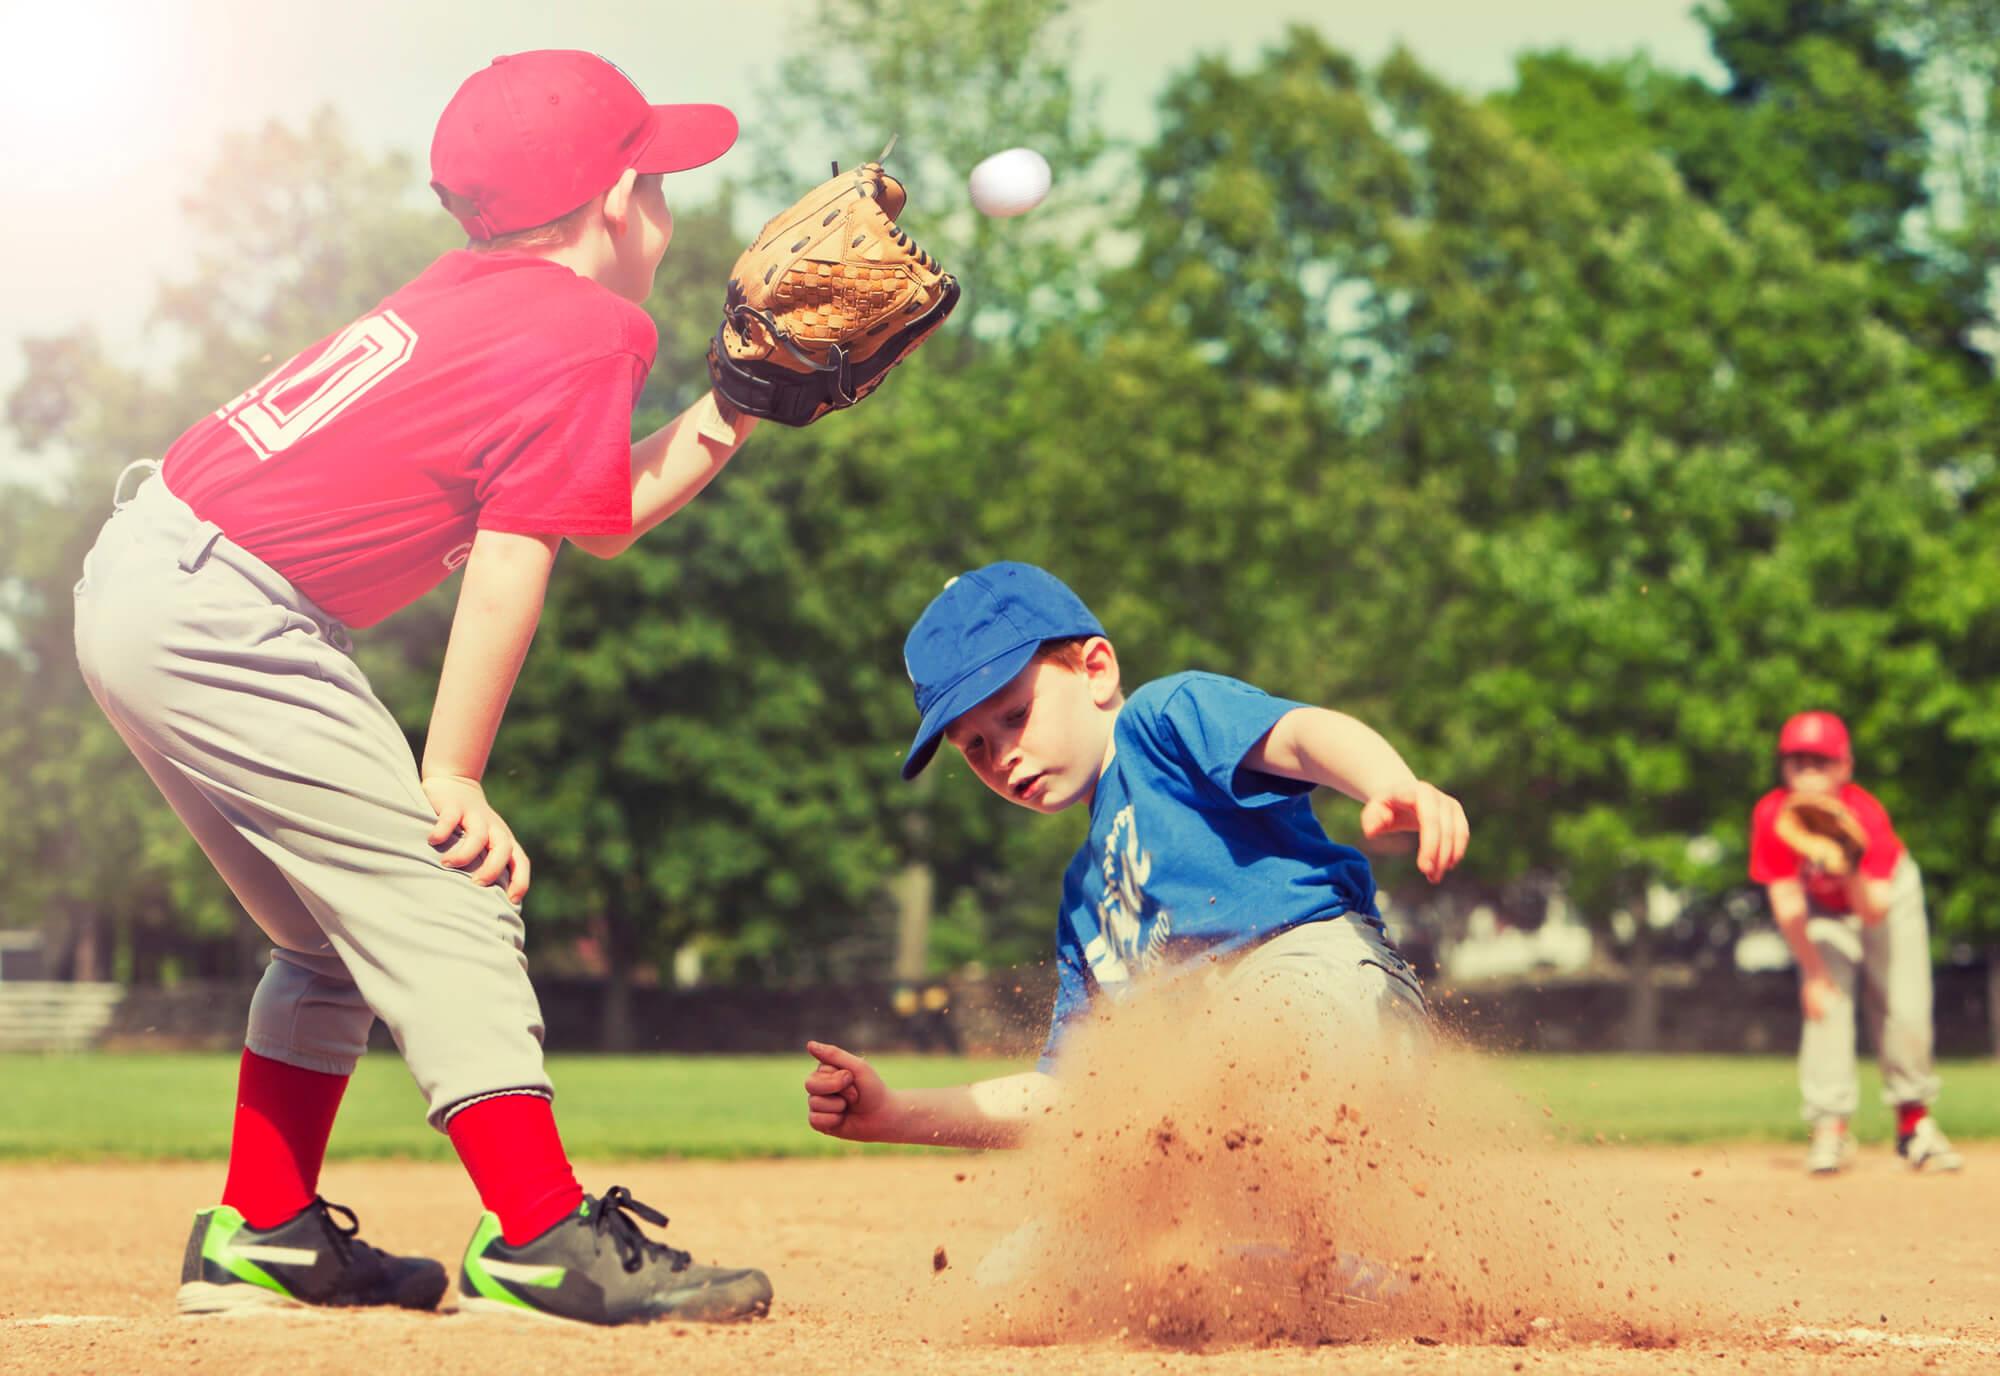 Little league baseball player sliding into second base.